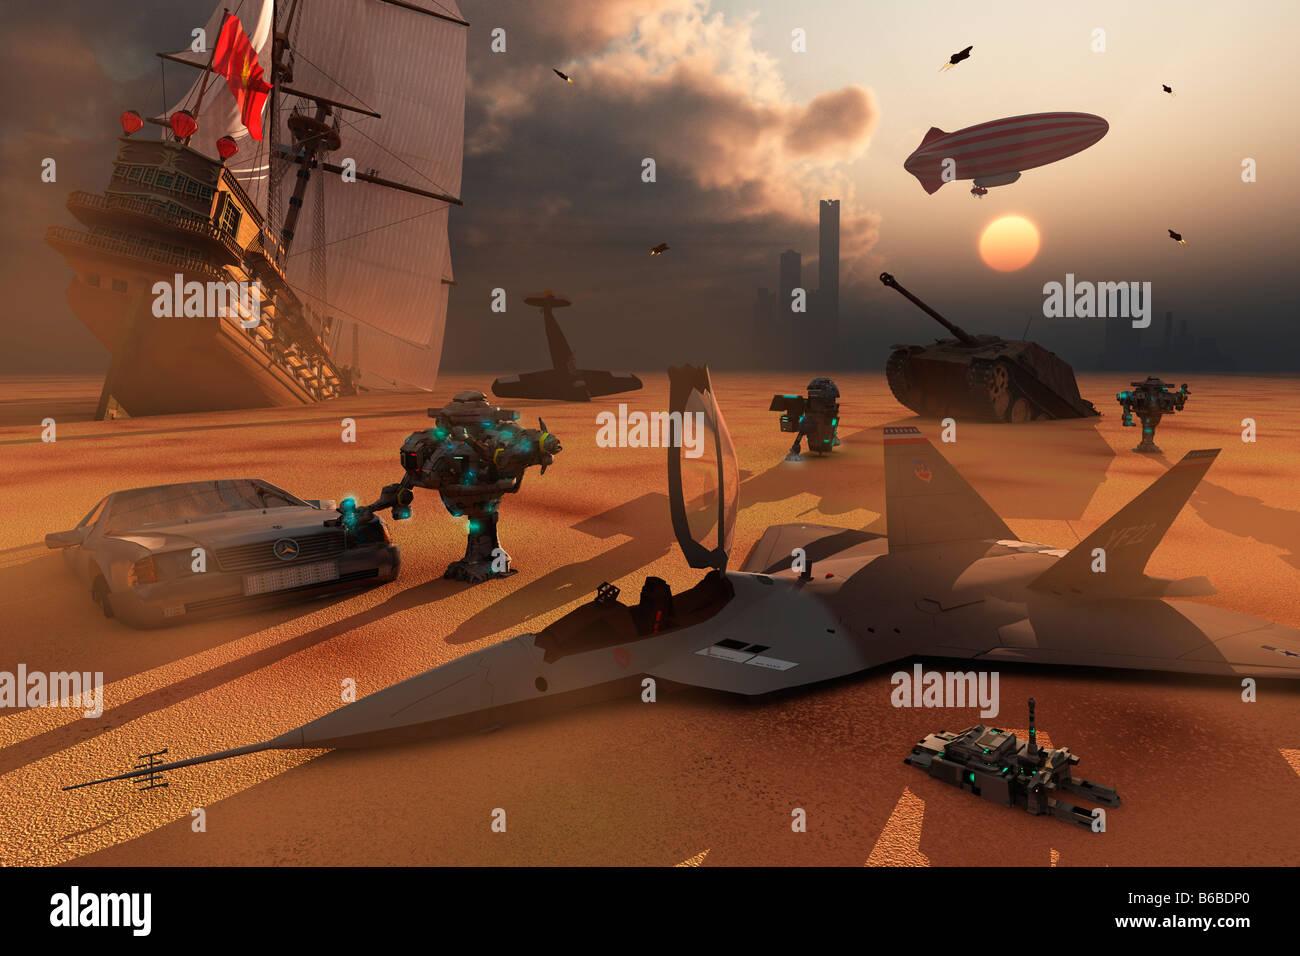 Robot Collectors A 3D conceptual Image - Stock Image